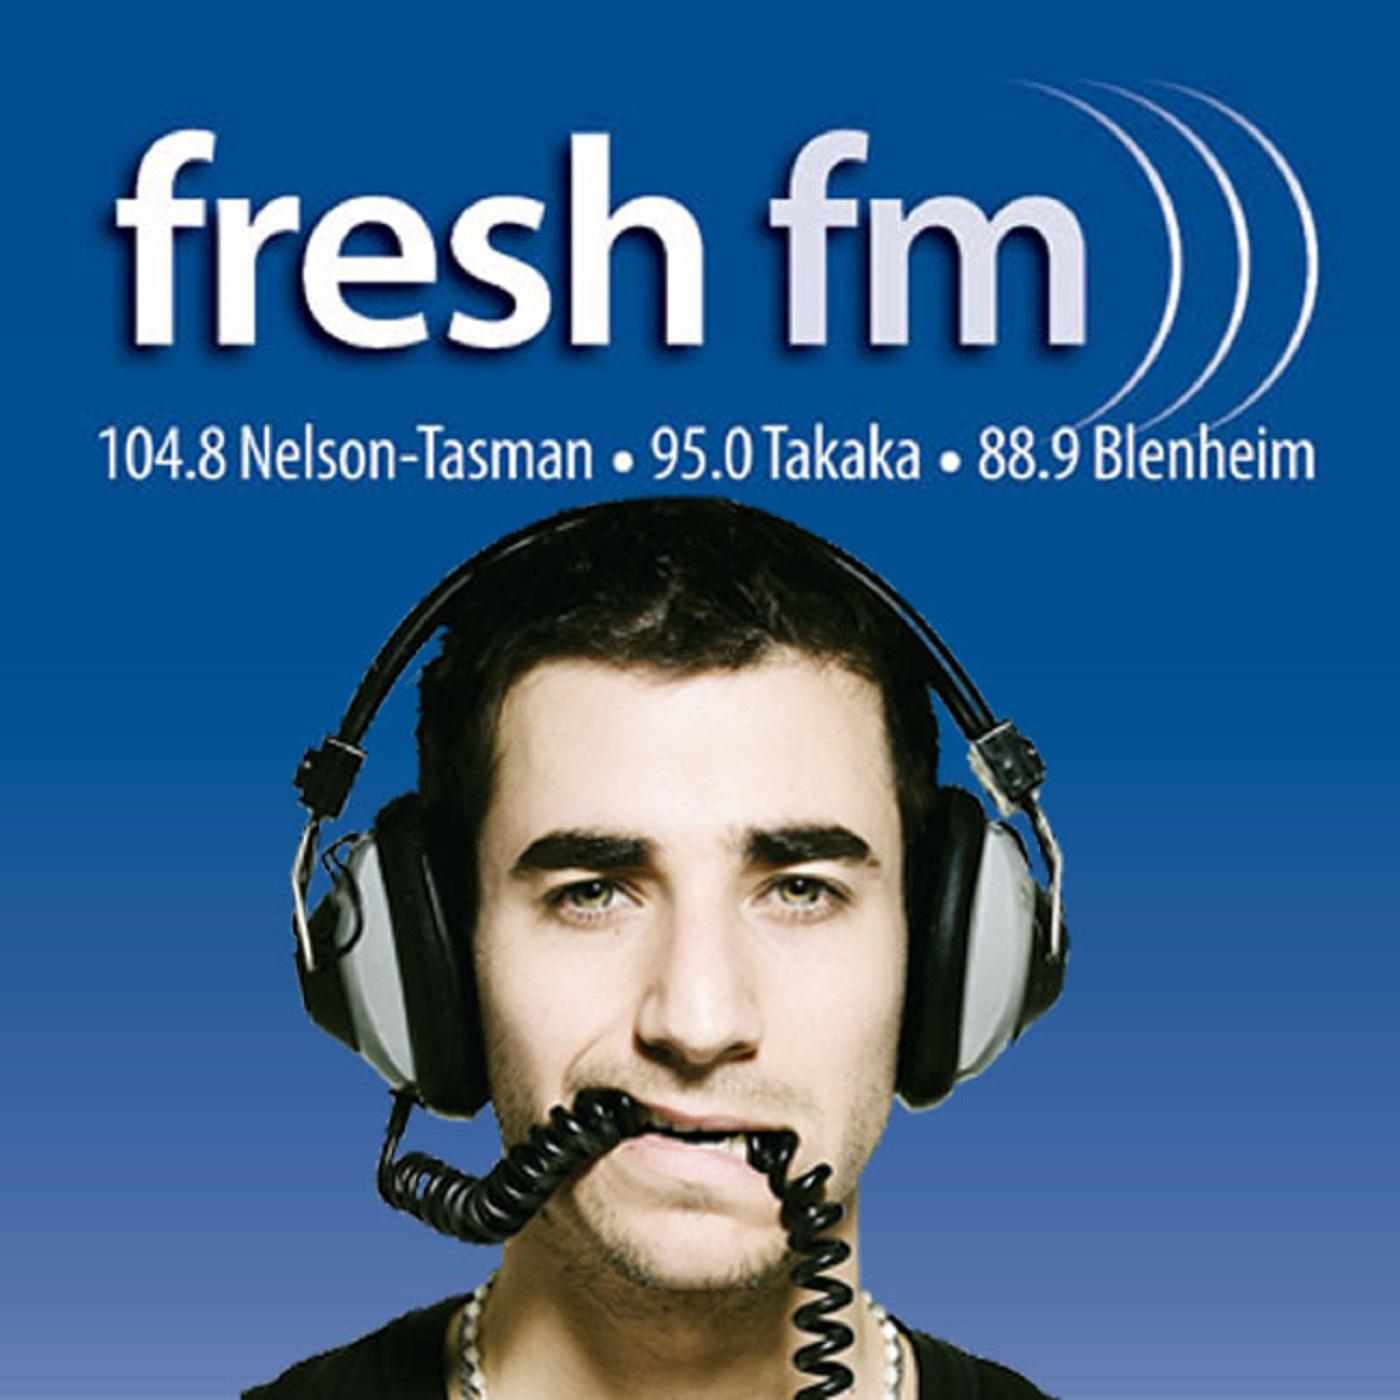 https://cdn.accessradio.org/StationFolder/freshfm/Images/Fresh-FM-Art140093.png